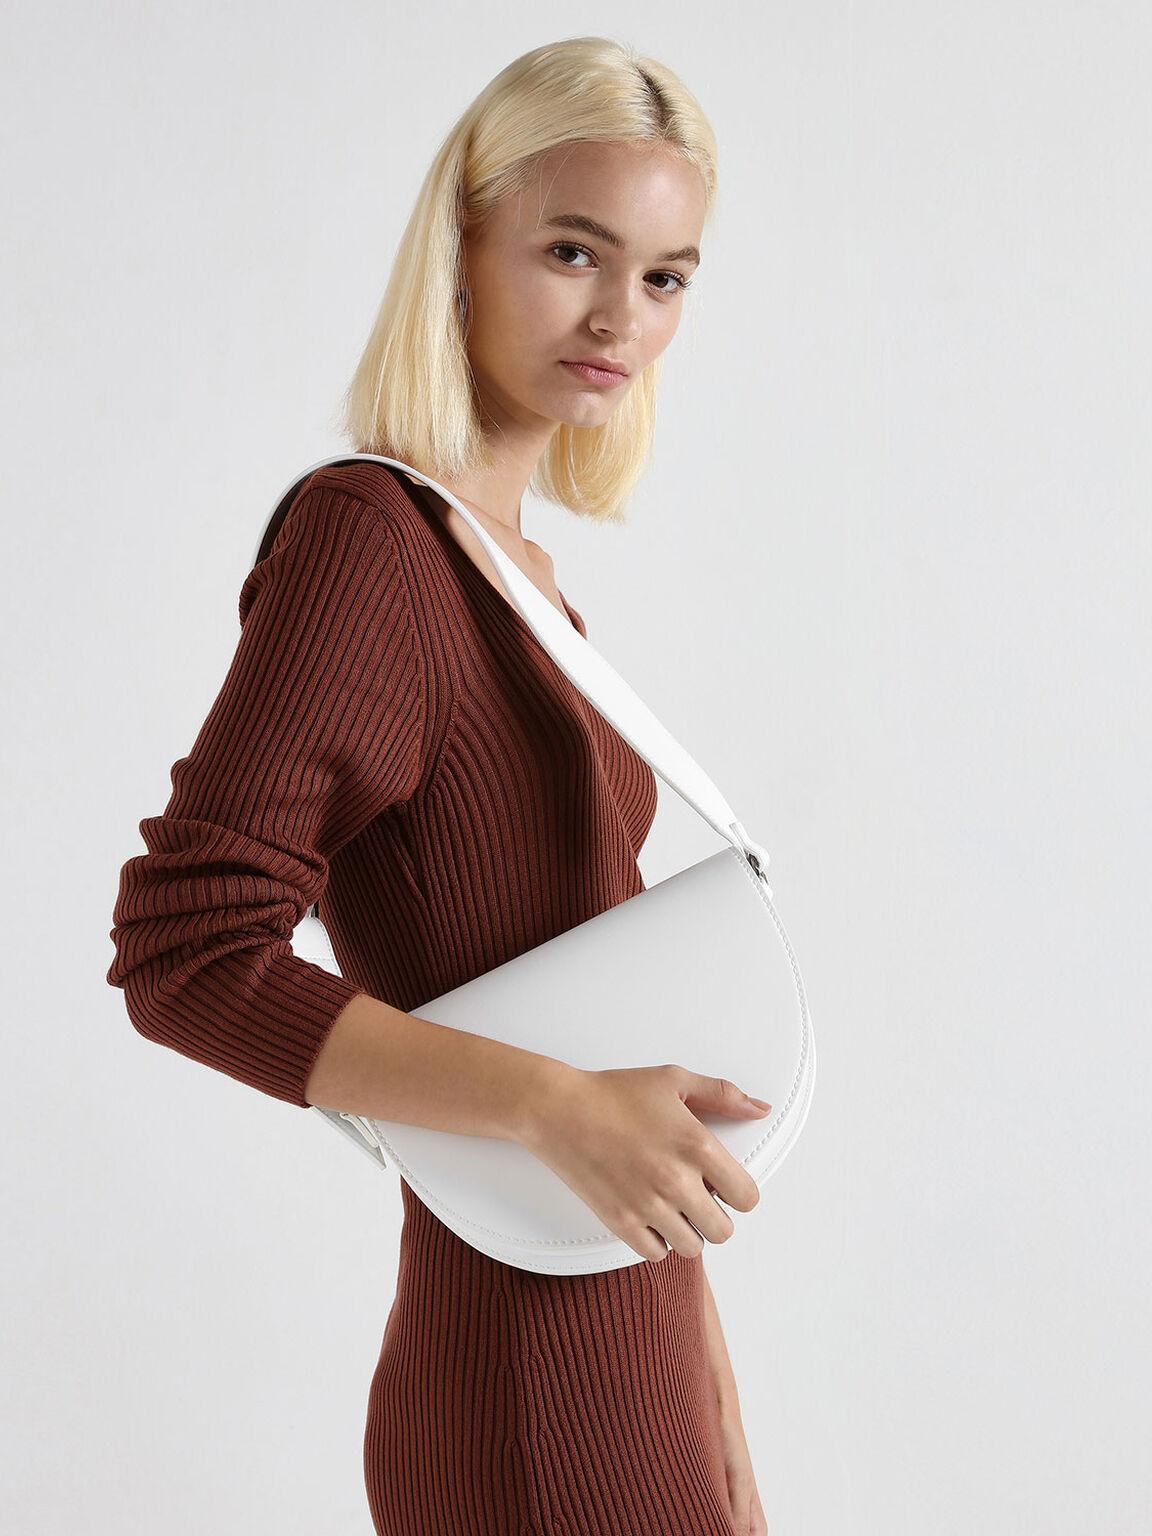 Classic Saddle Bag, White, hi-res